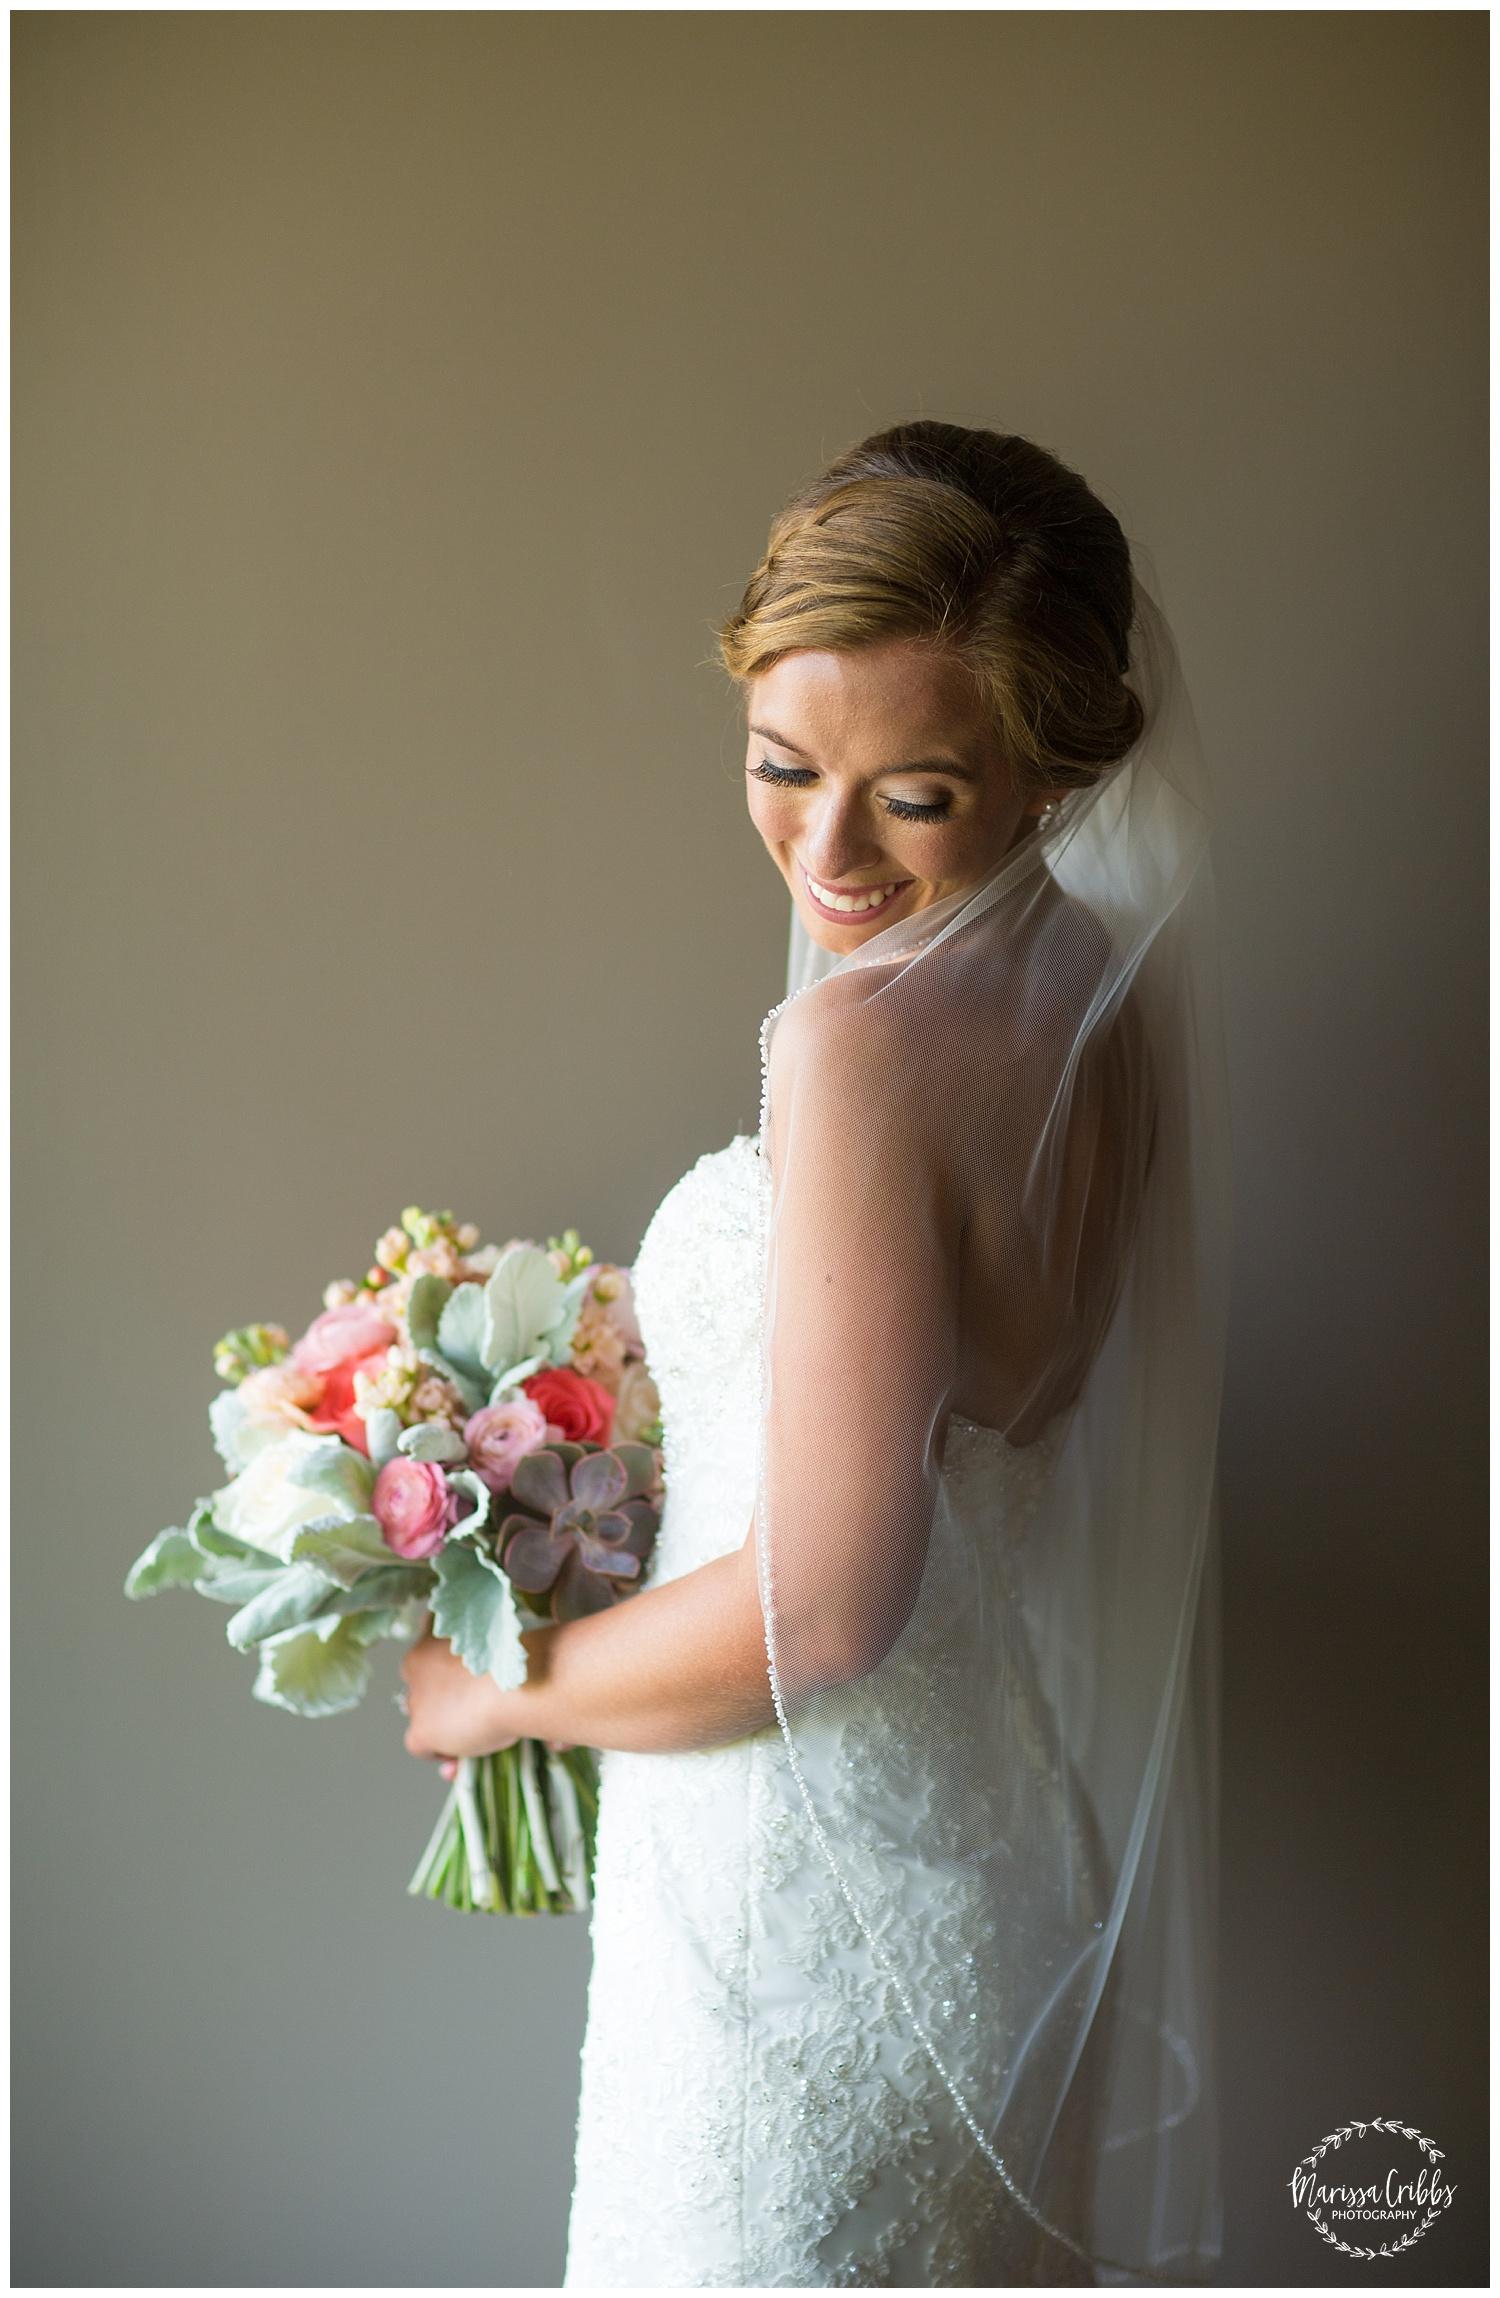 Twin Double Wedding | Union Horse Distilling Co. | Marissa Cribbs Photography | KC Weddings_0094.jpg